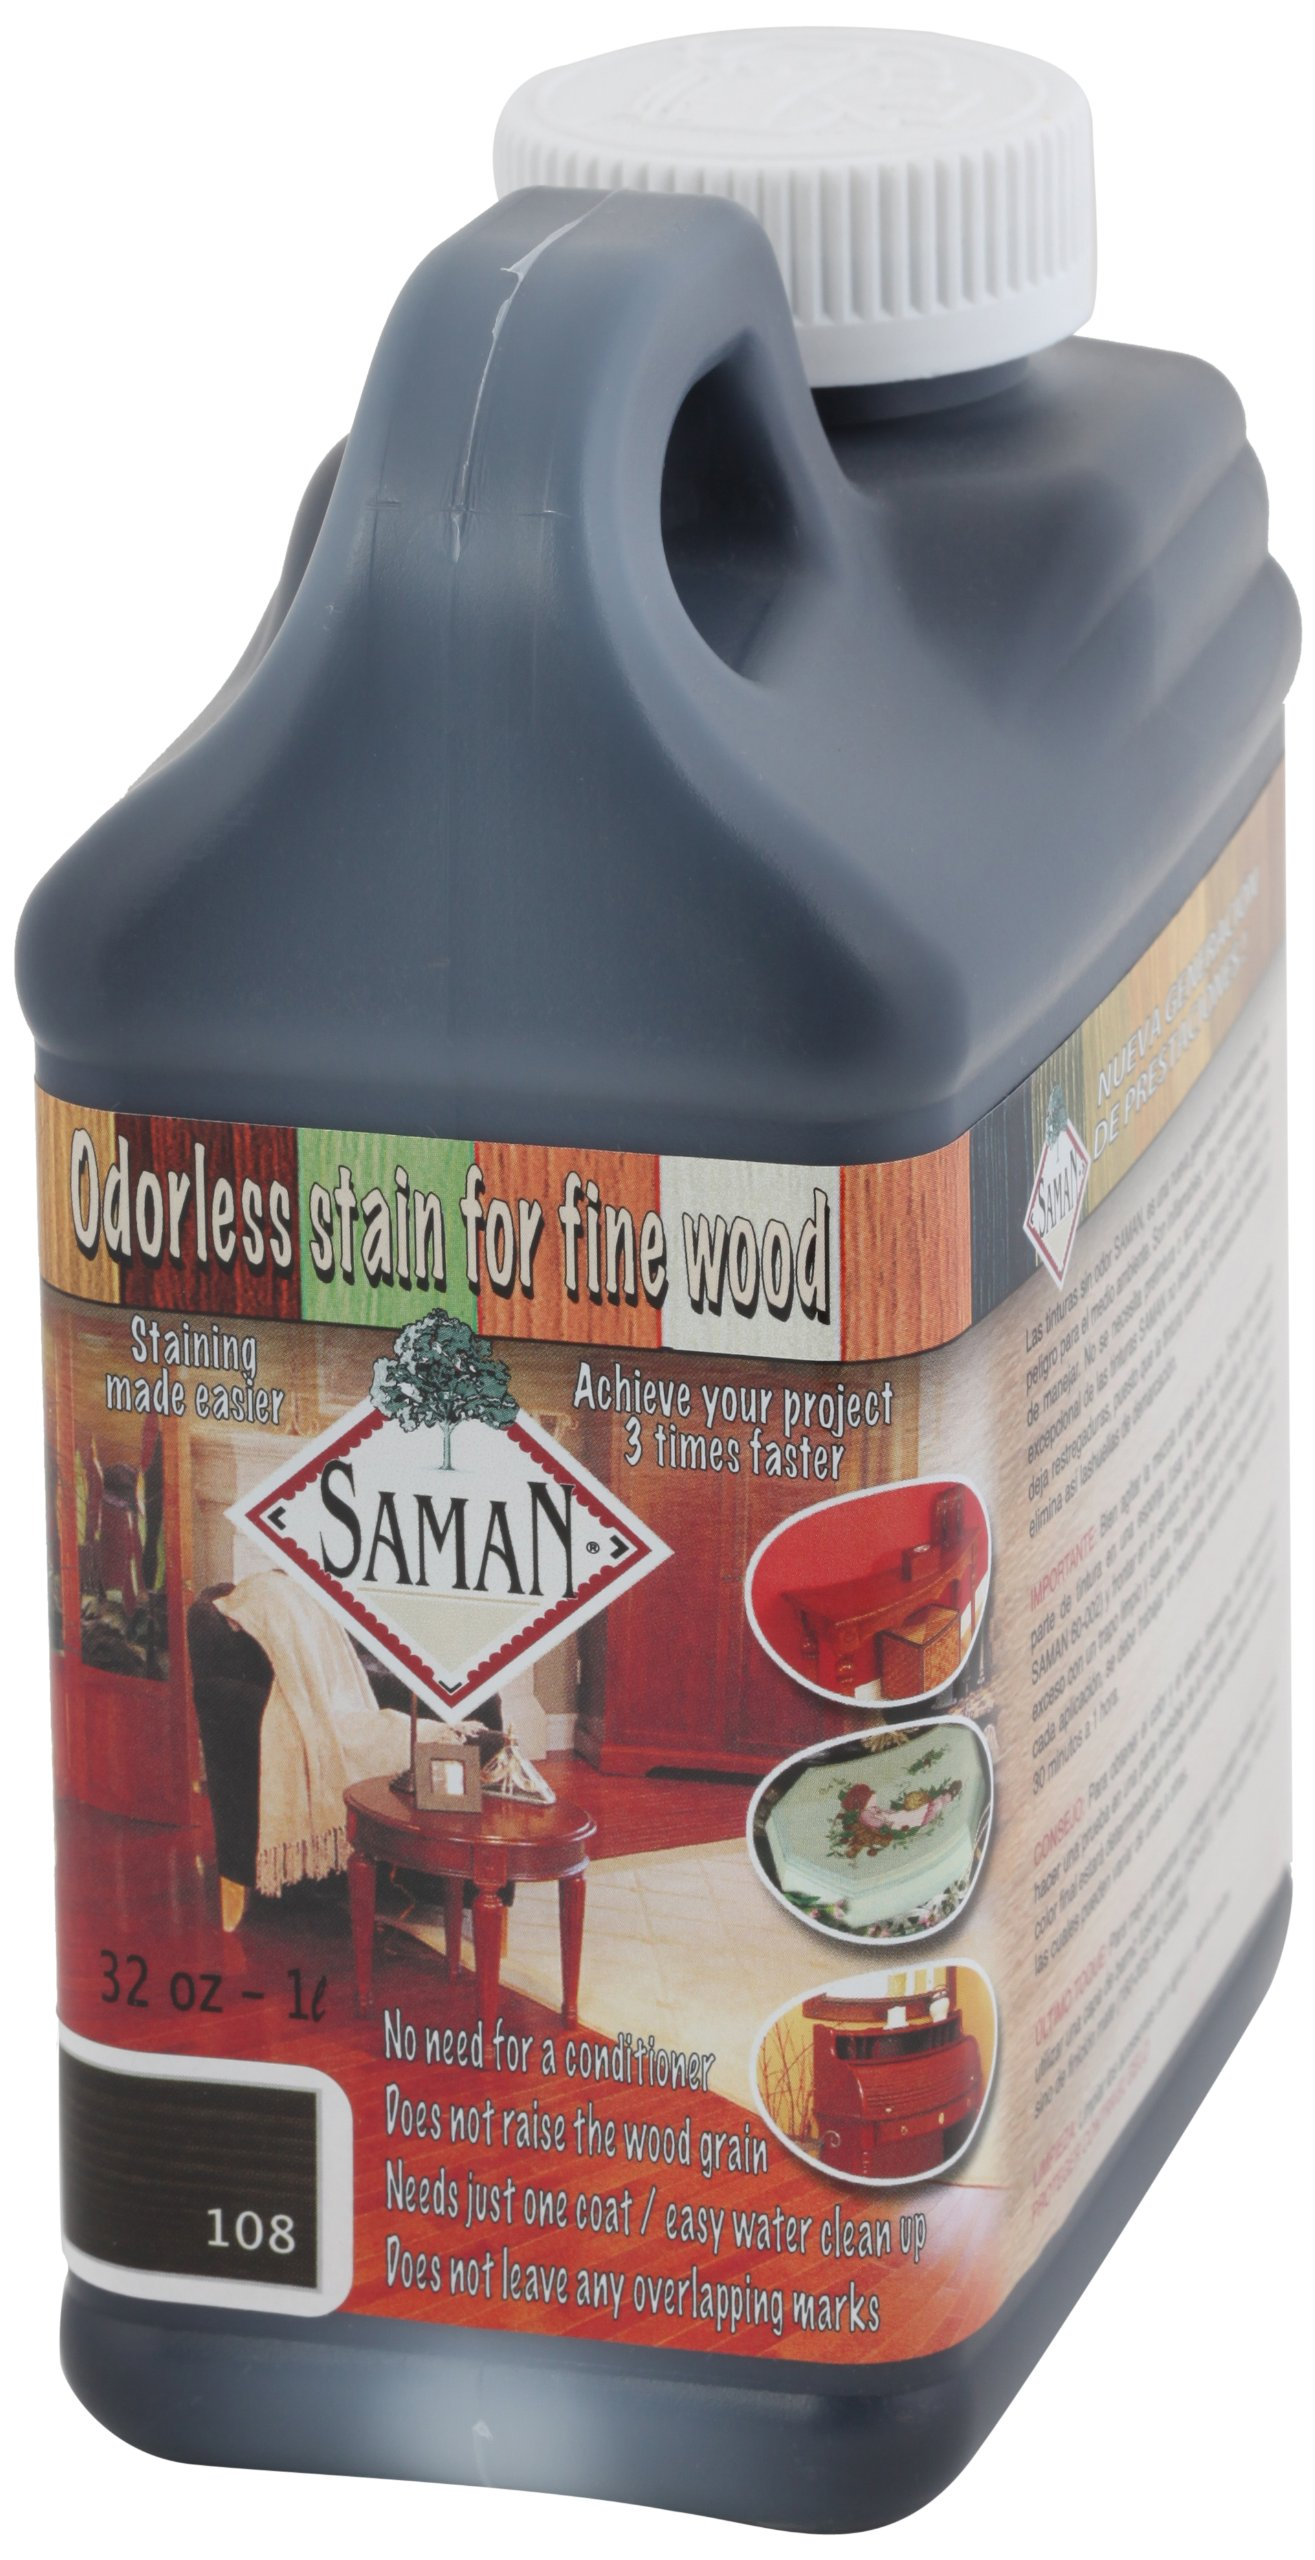 SamaN Interior Water Based Stain for Fine Wood, Black, 1 Quart